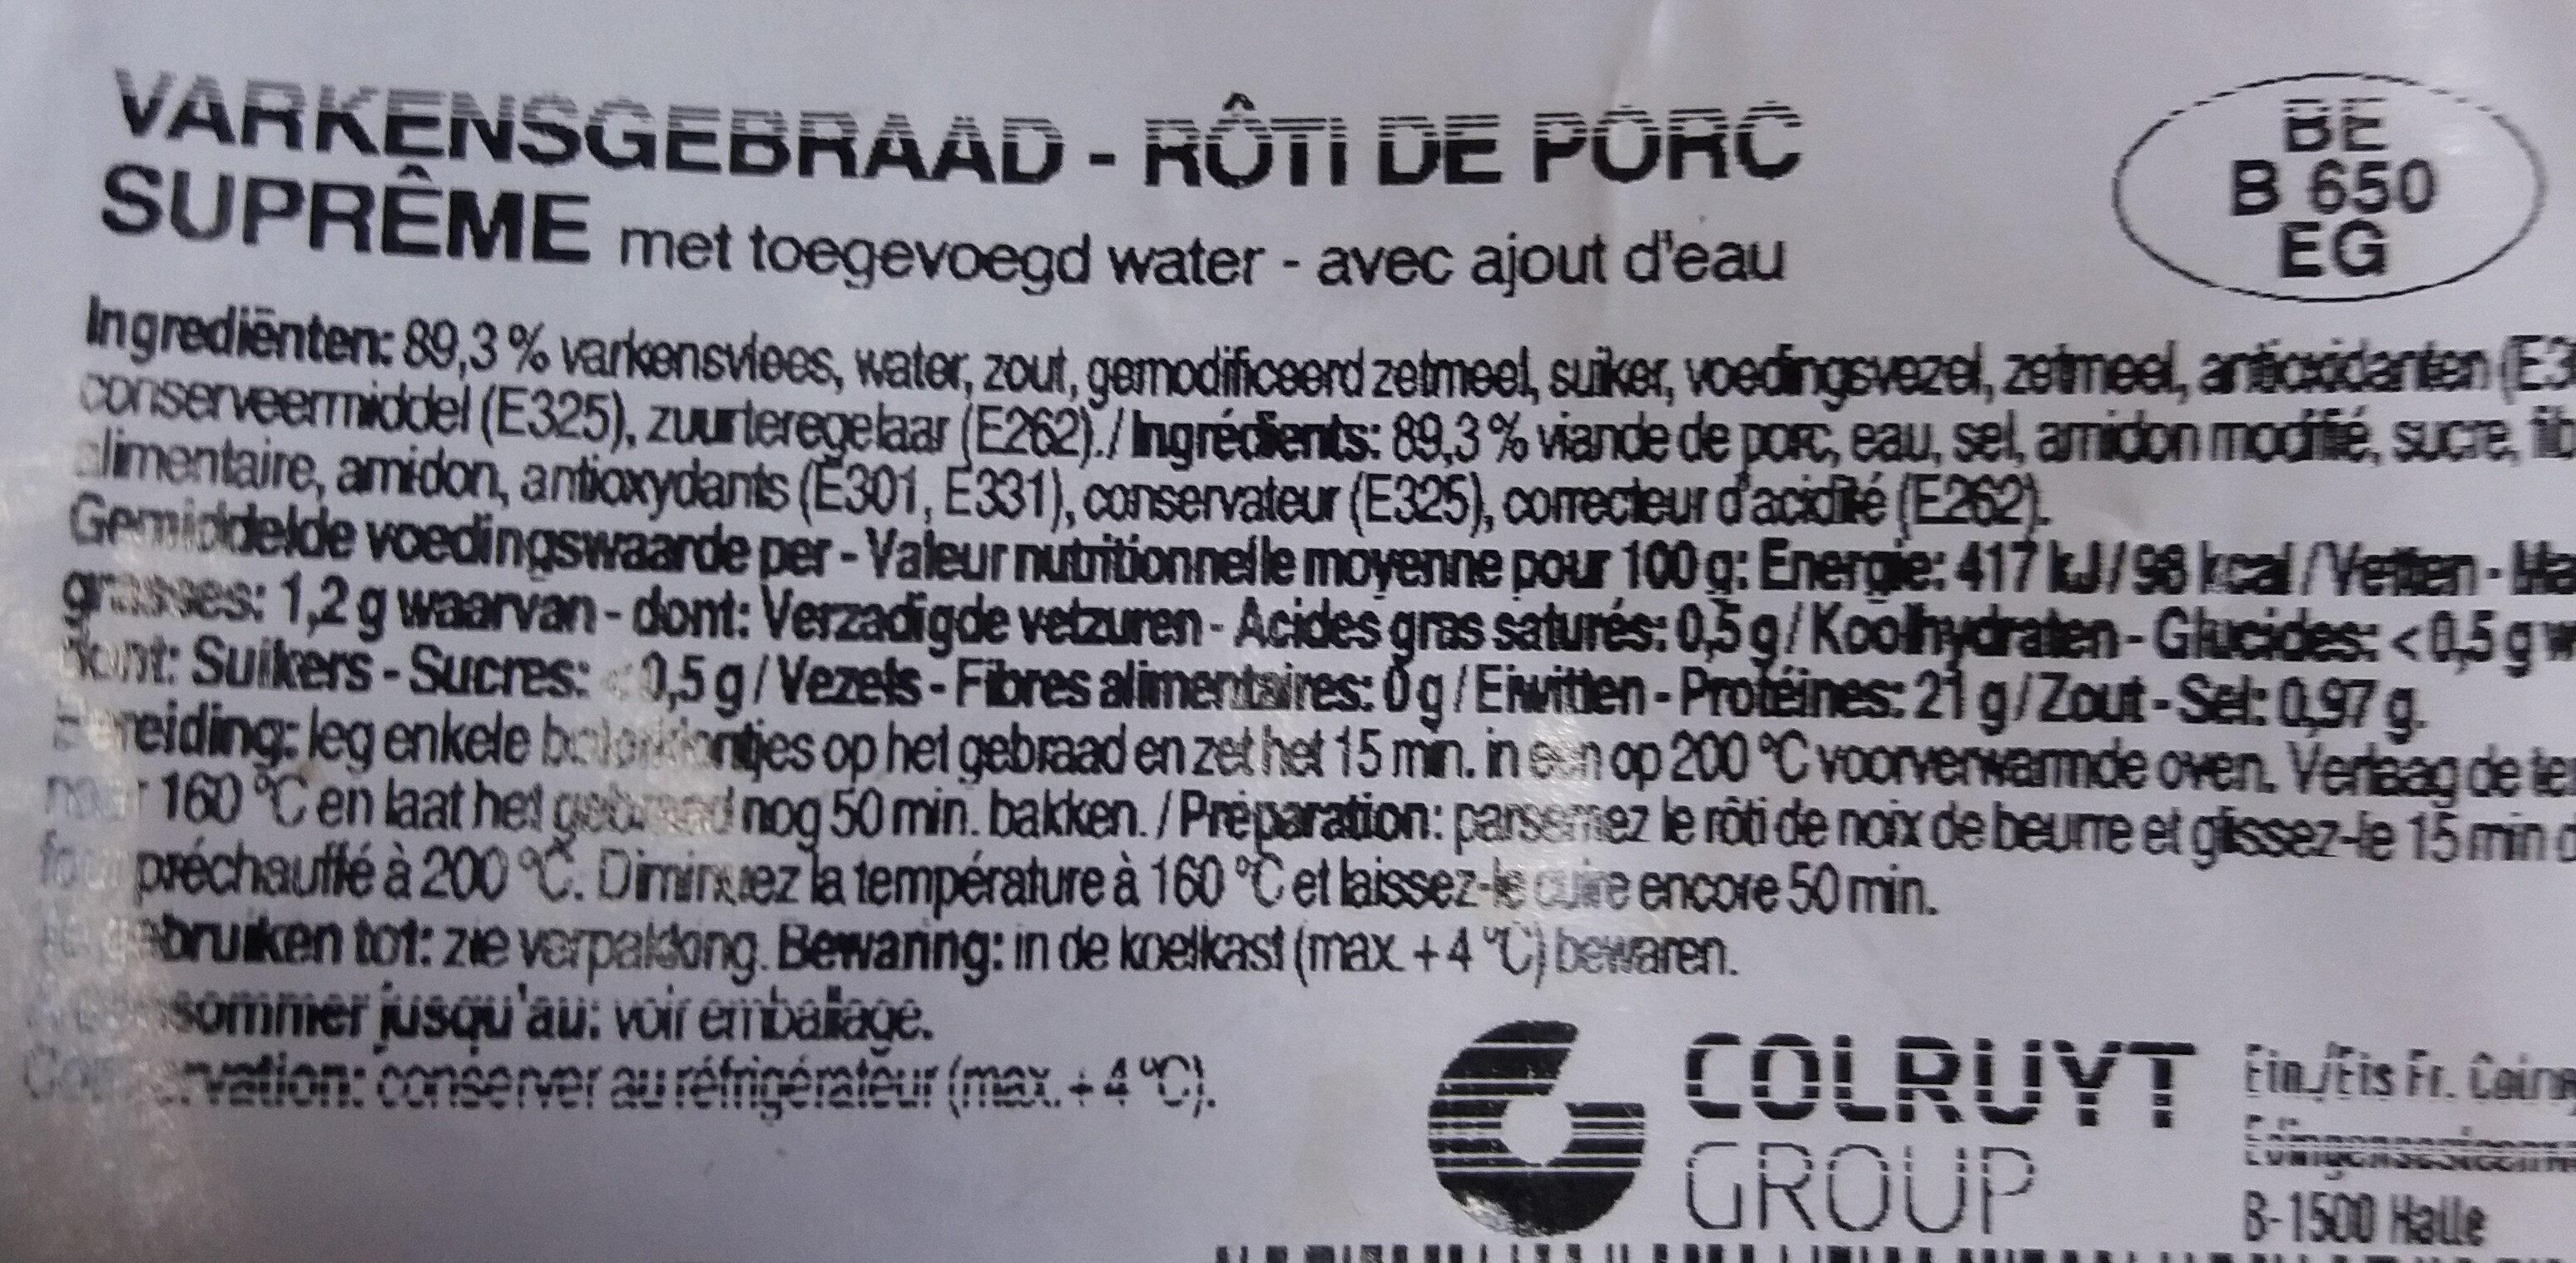 Rôti de porc suprême - Ingredients - fr